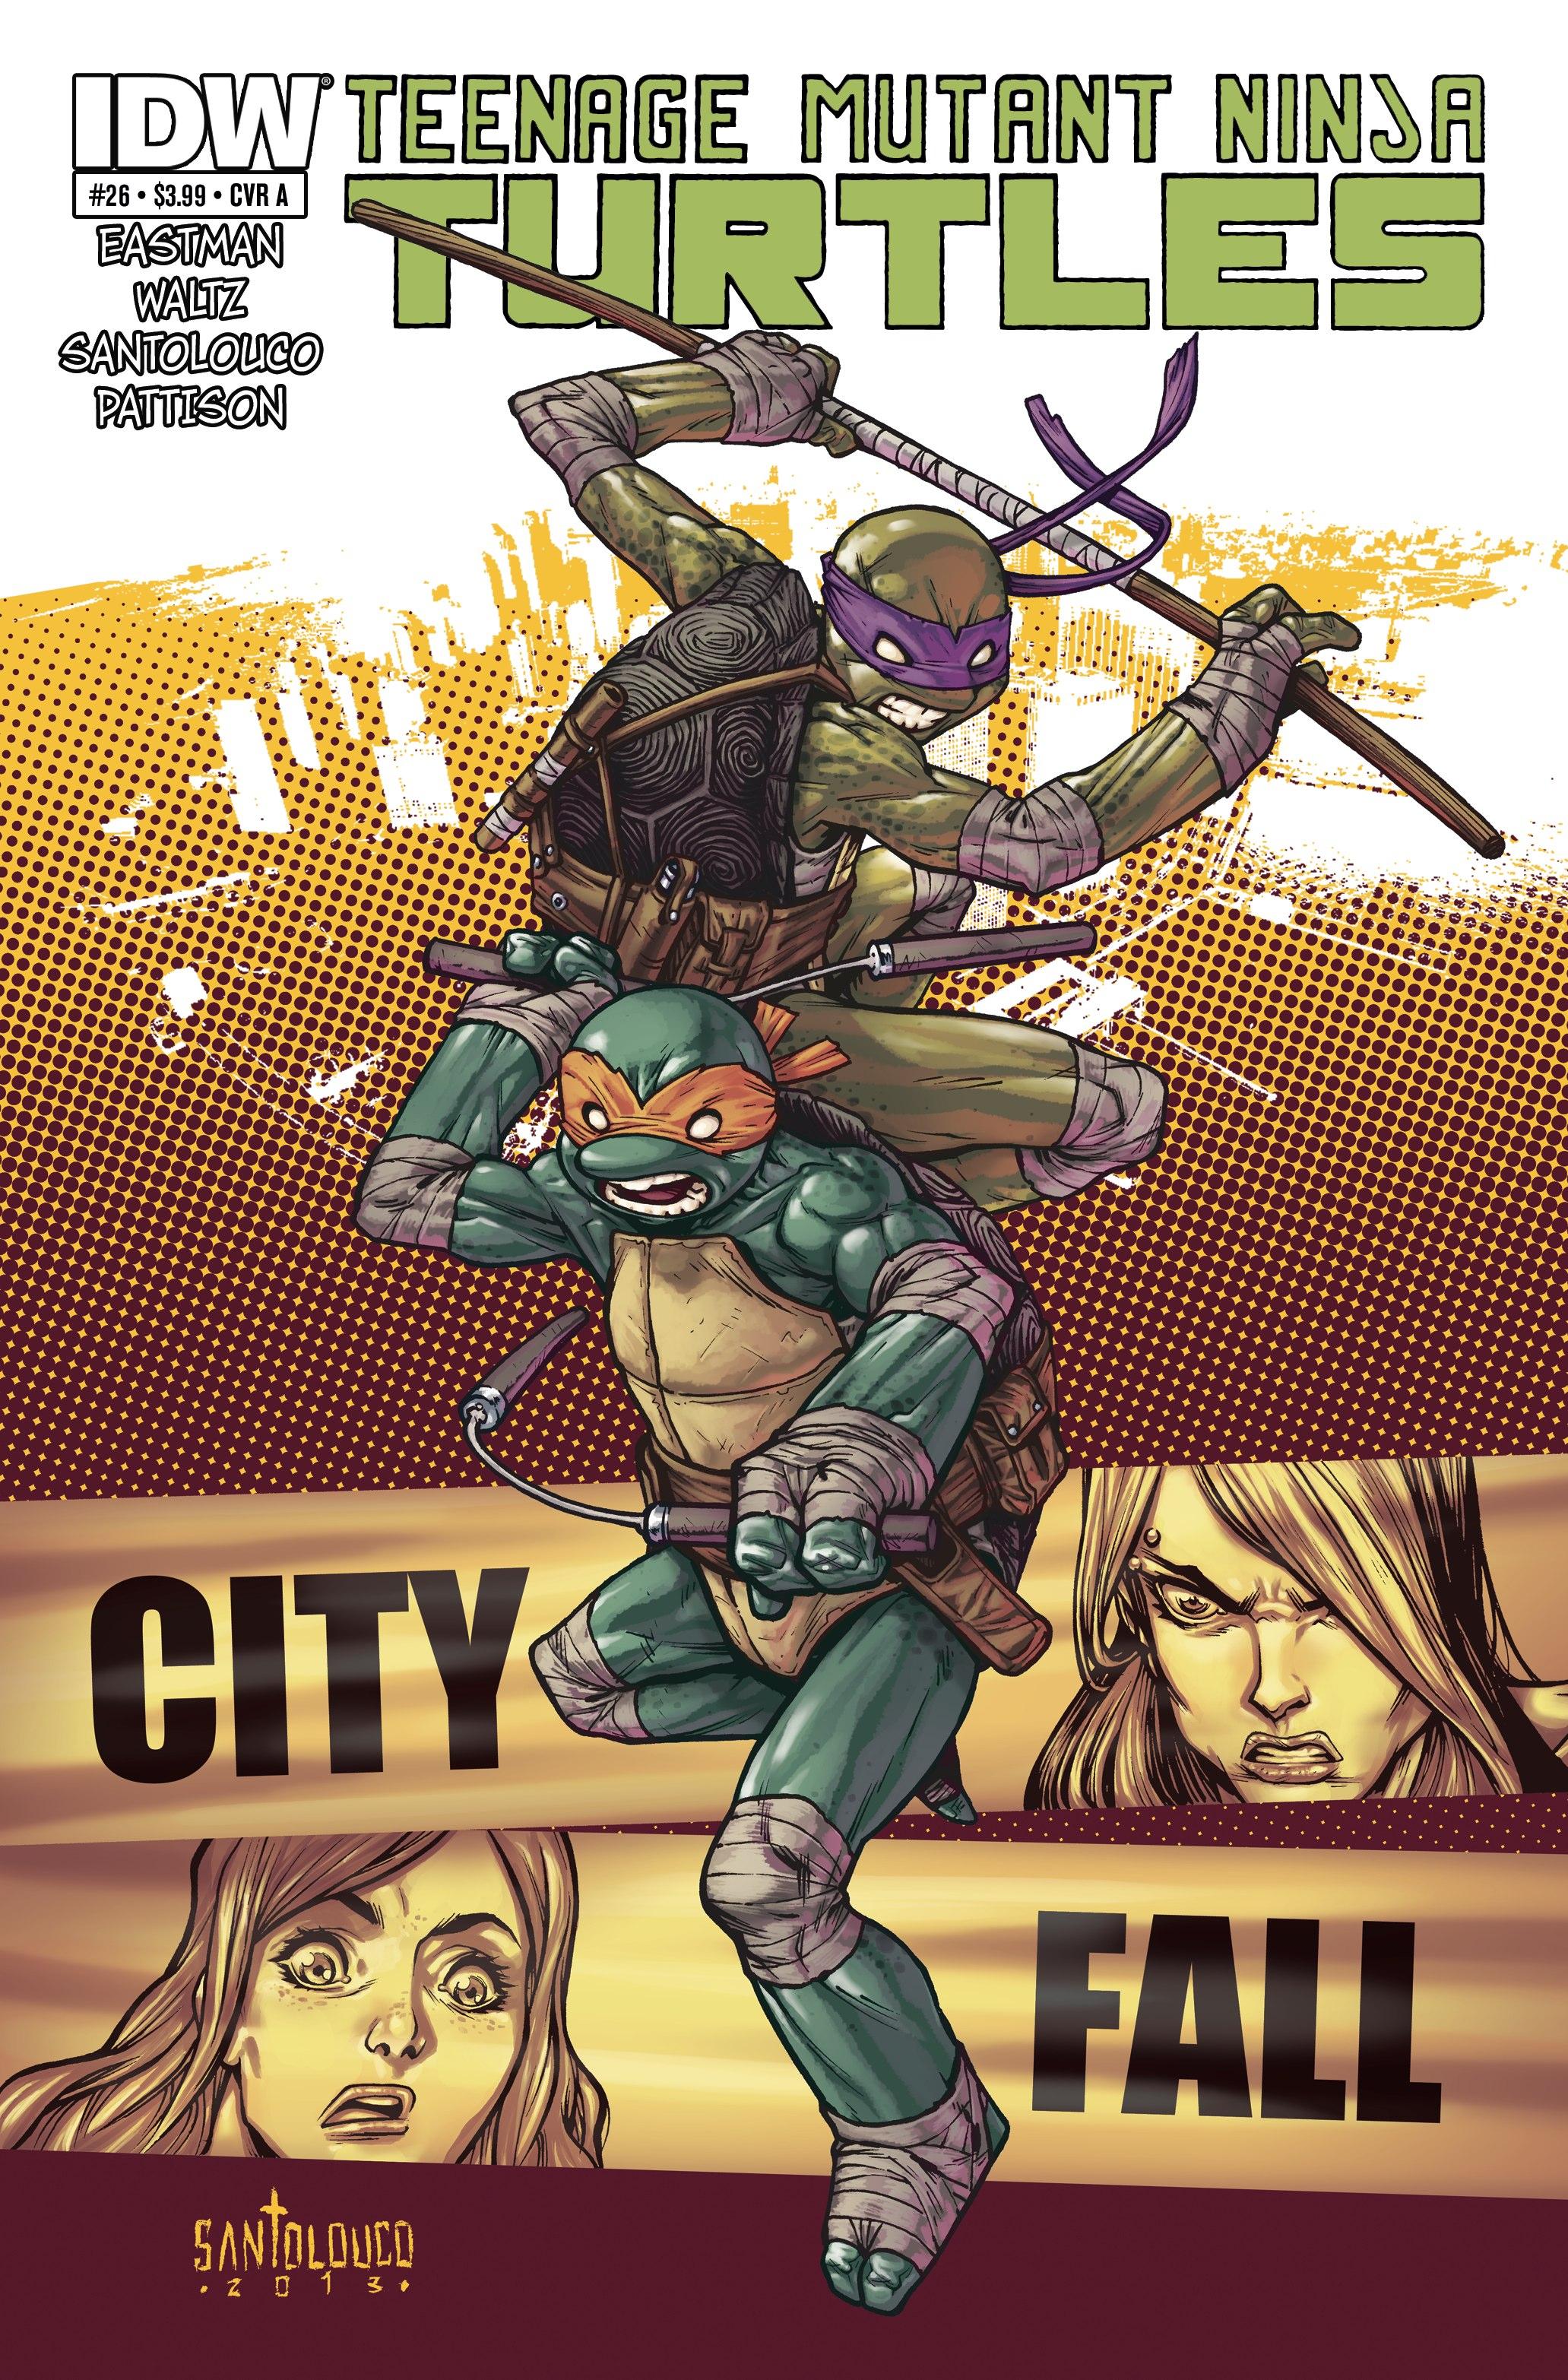 City Fall, part 5